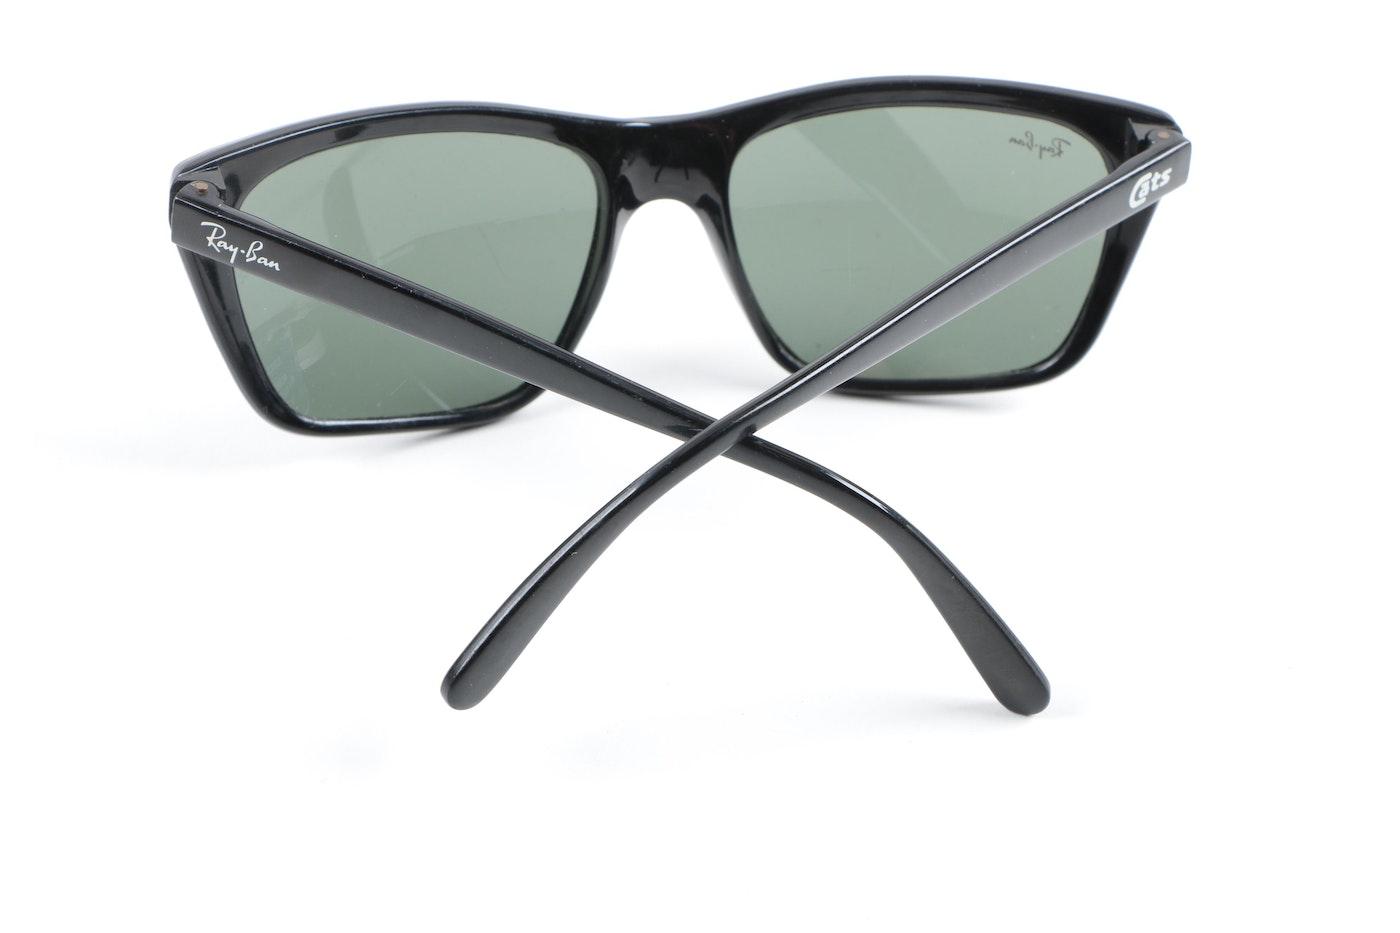 41a3096e2c Vintage Ray-Ban Cats Sunglasses   EBTH